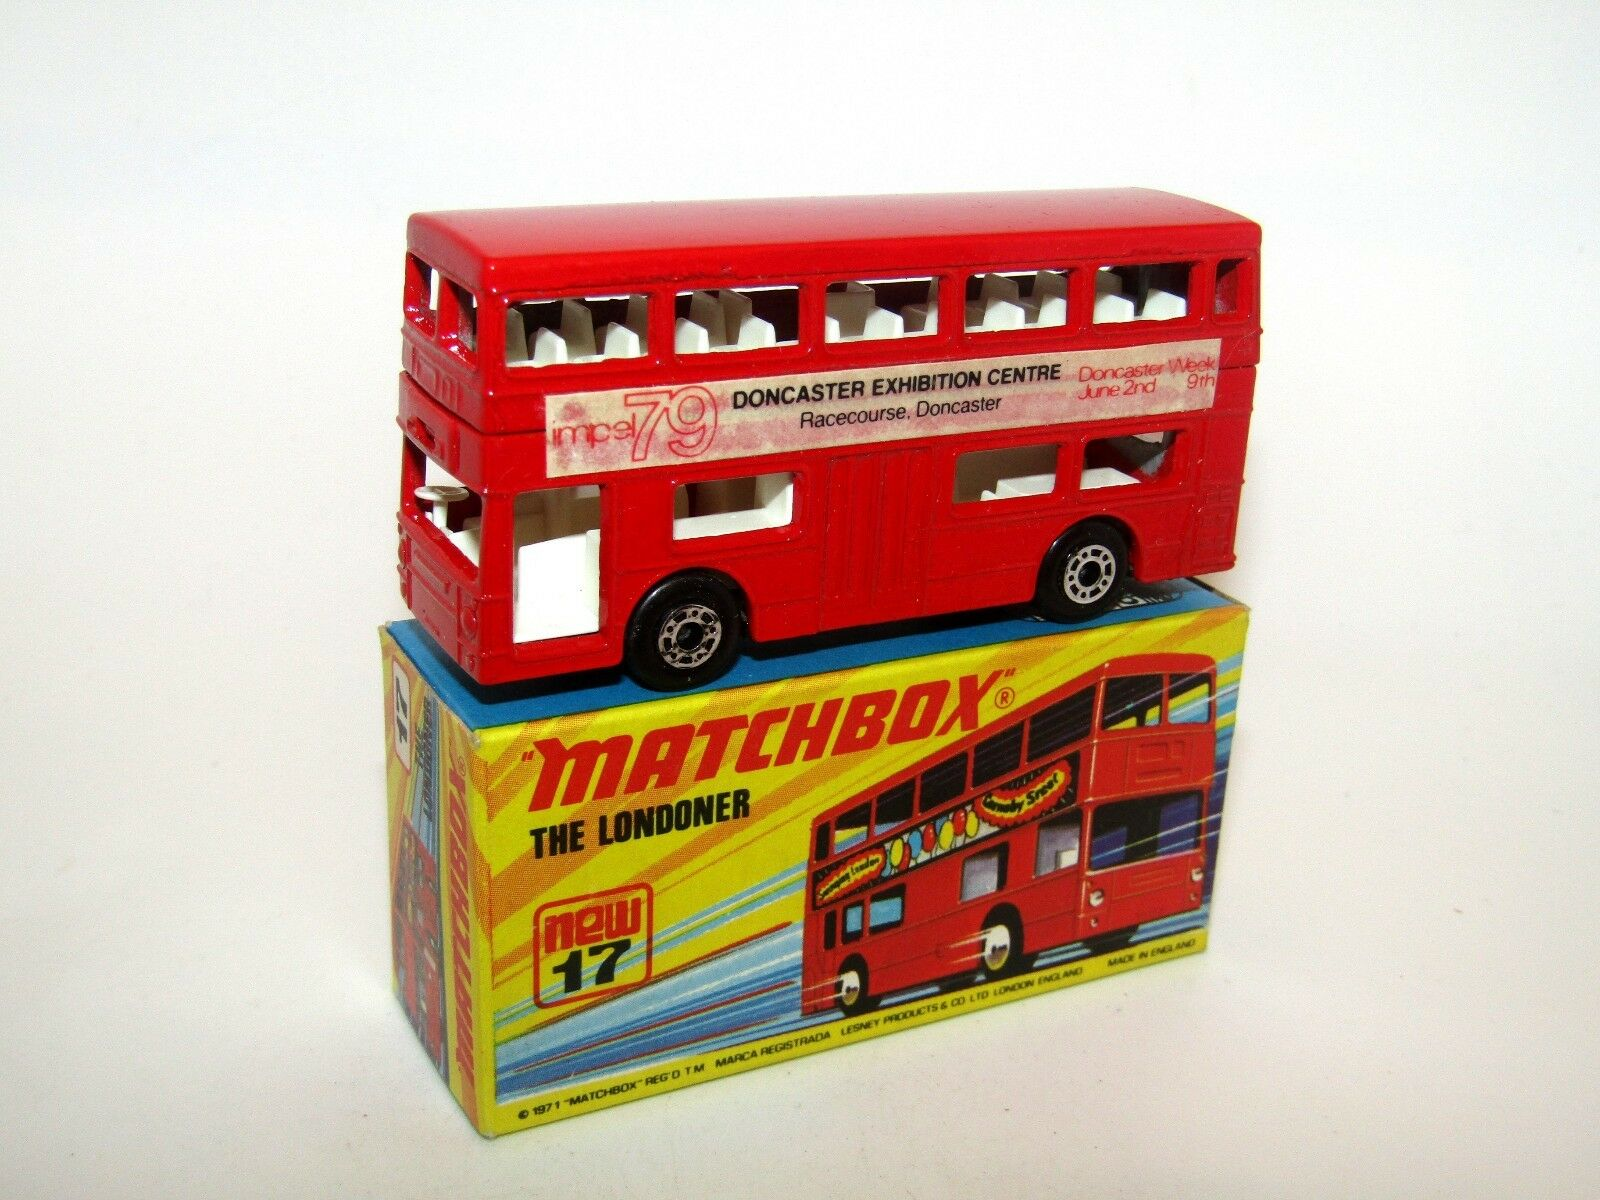 Matchbox Superfast No 17 The Londoner Impel 79 Very RARE MIB